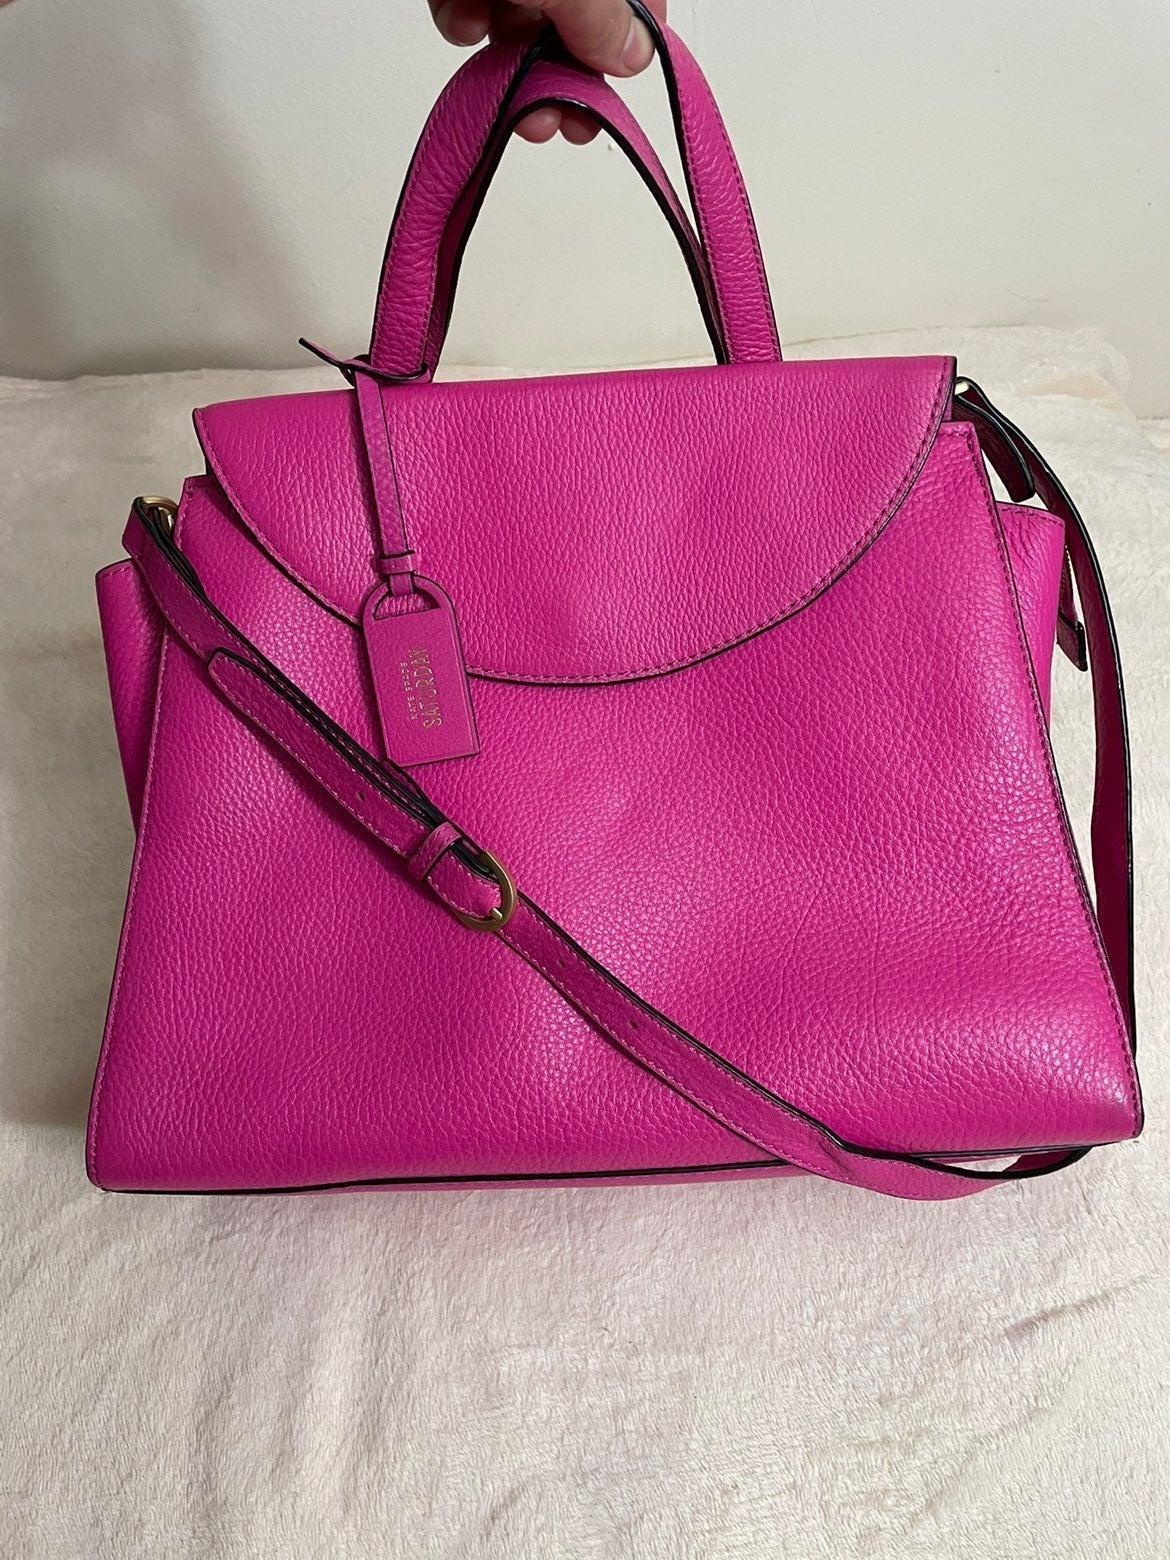 ✅Kate Spade Saturday Hot pink Satchel